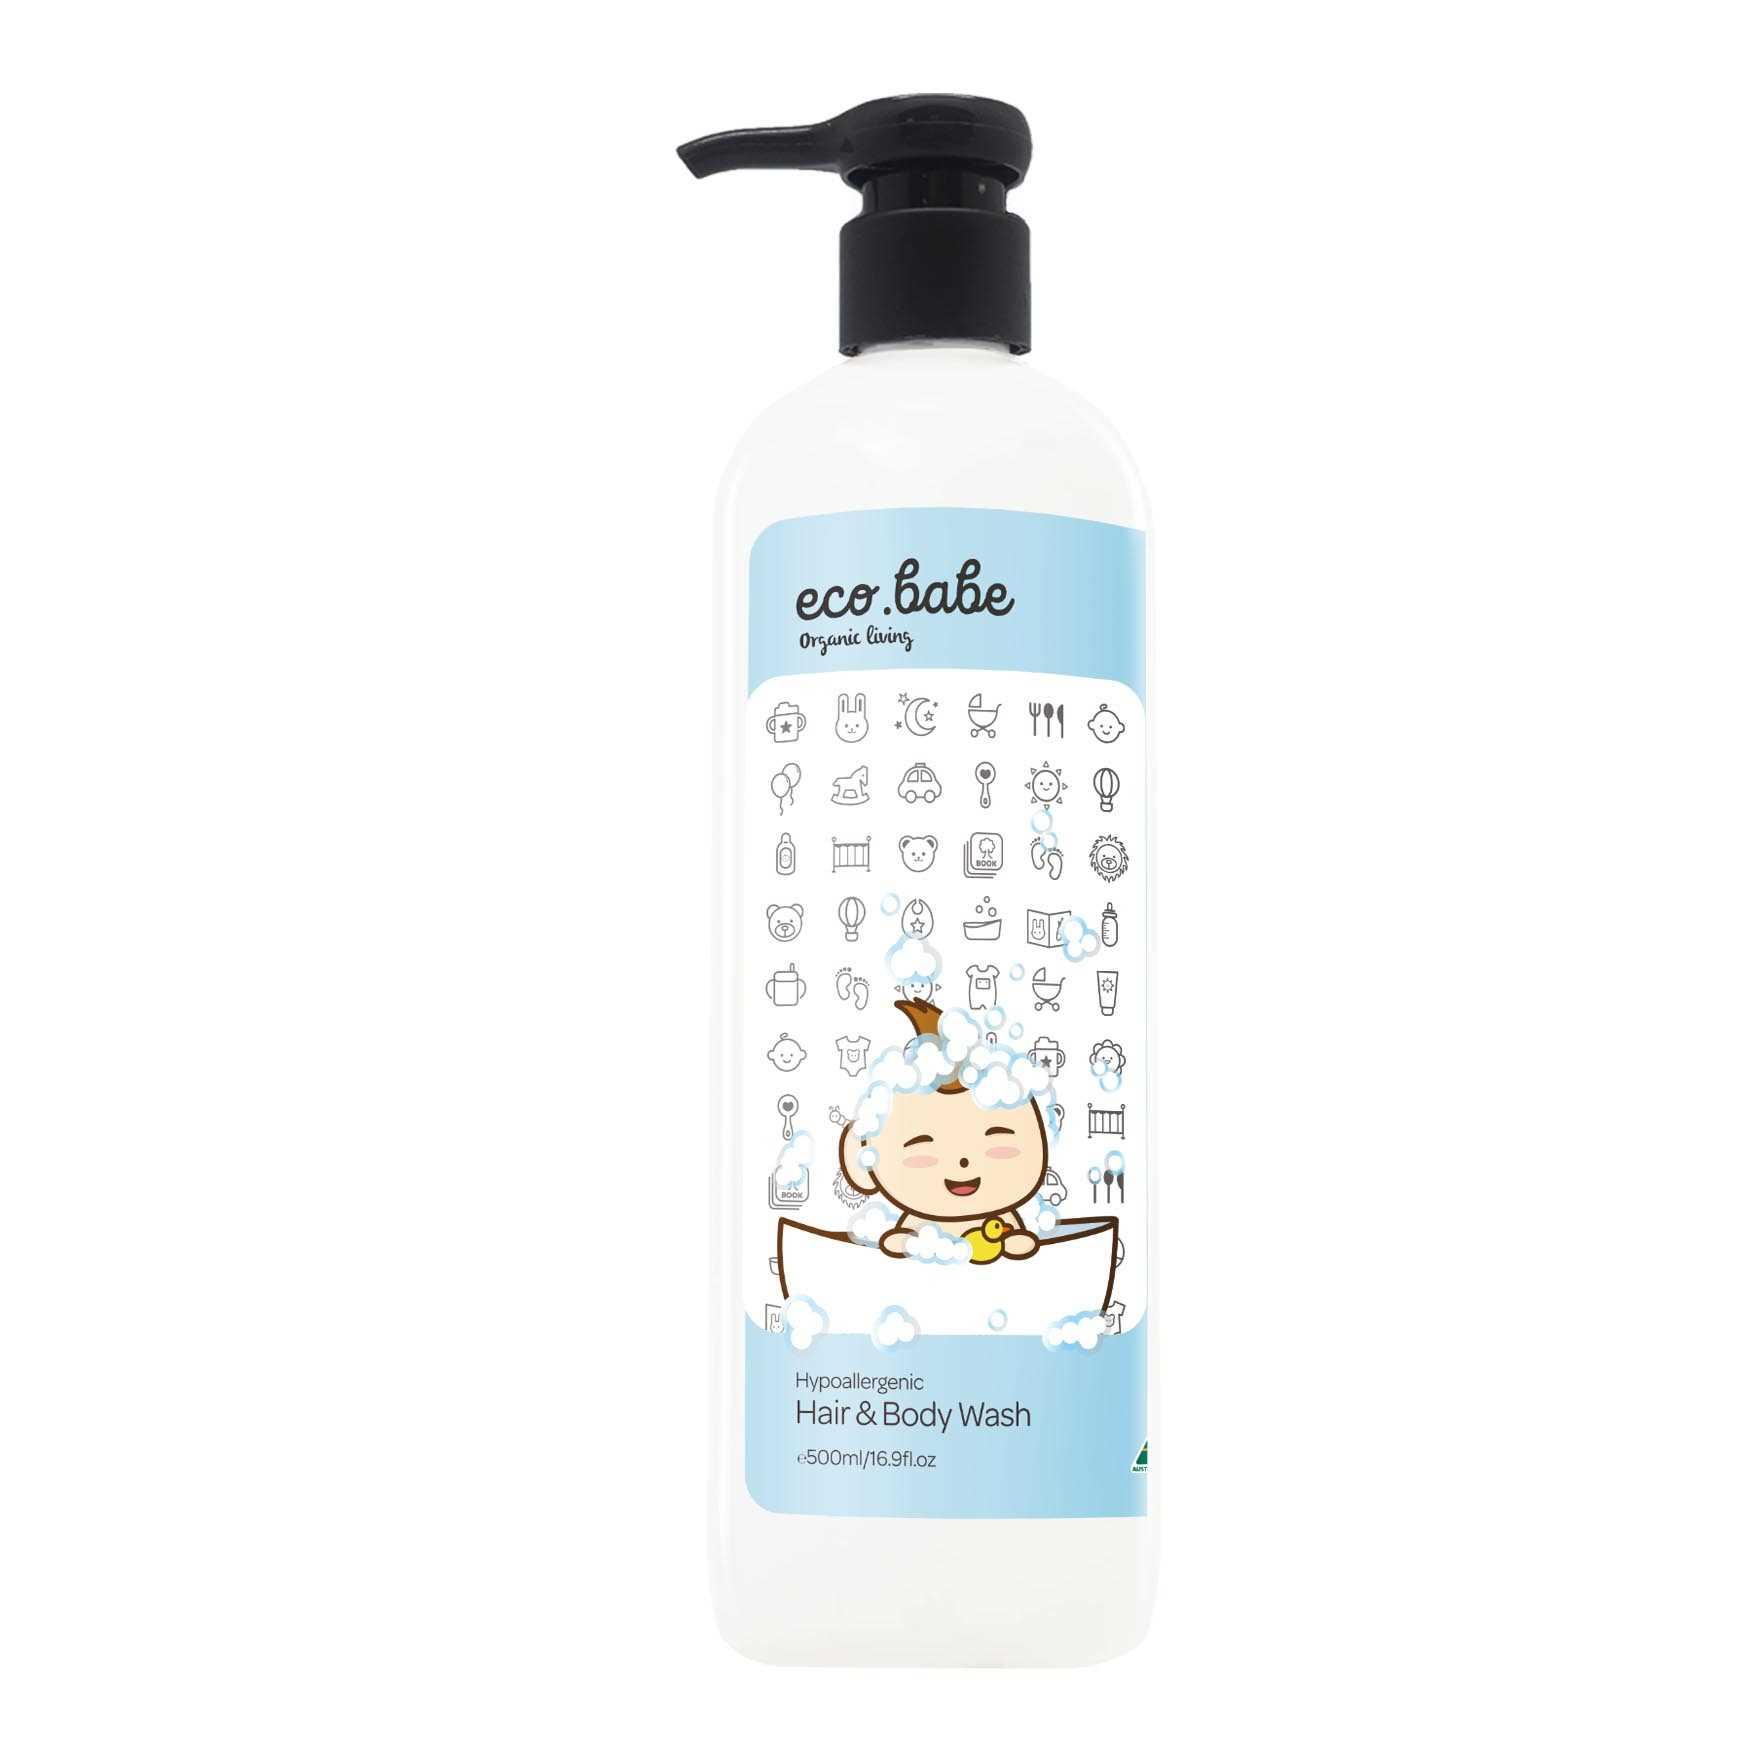 eco.babe 澳洲有机减敏洗发沐浴露(500ml)